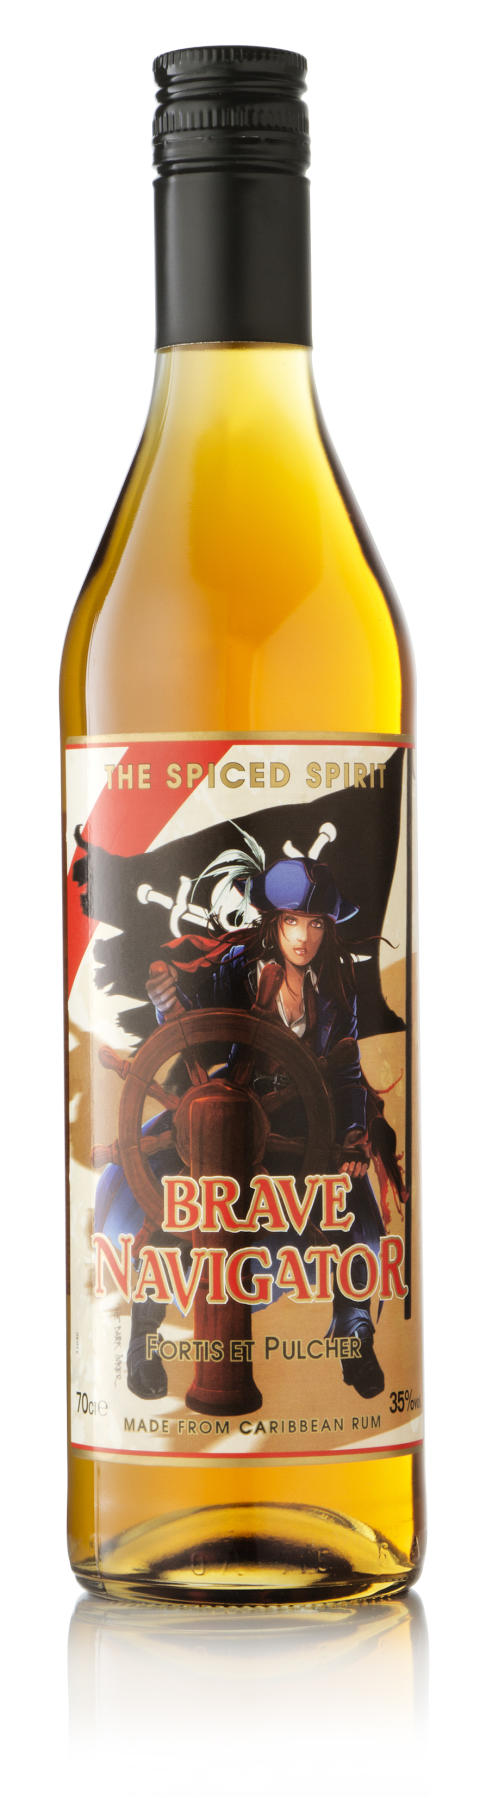 Ny spiced rum - Brave Navigator